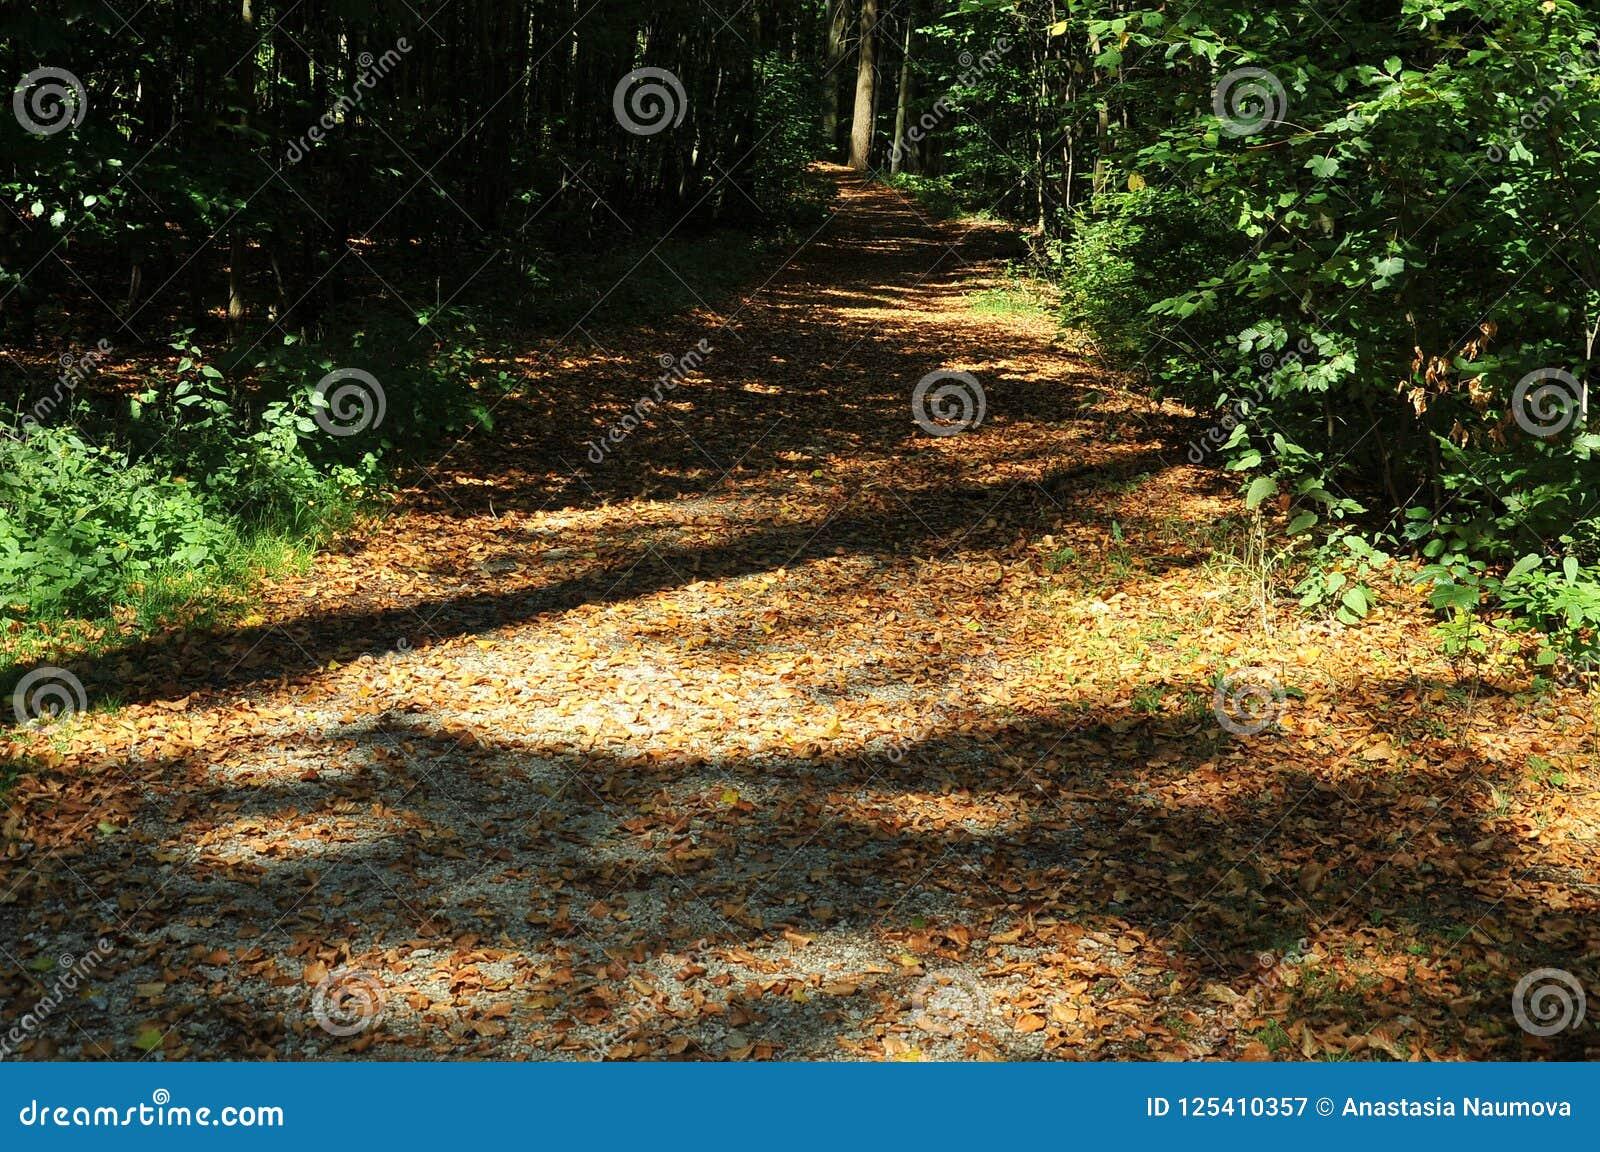 Forest near Pisek, Southern Bohemia, Czech Republic